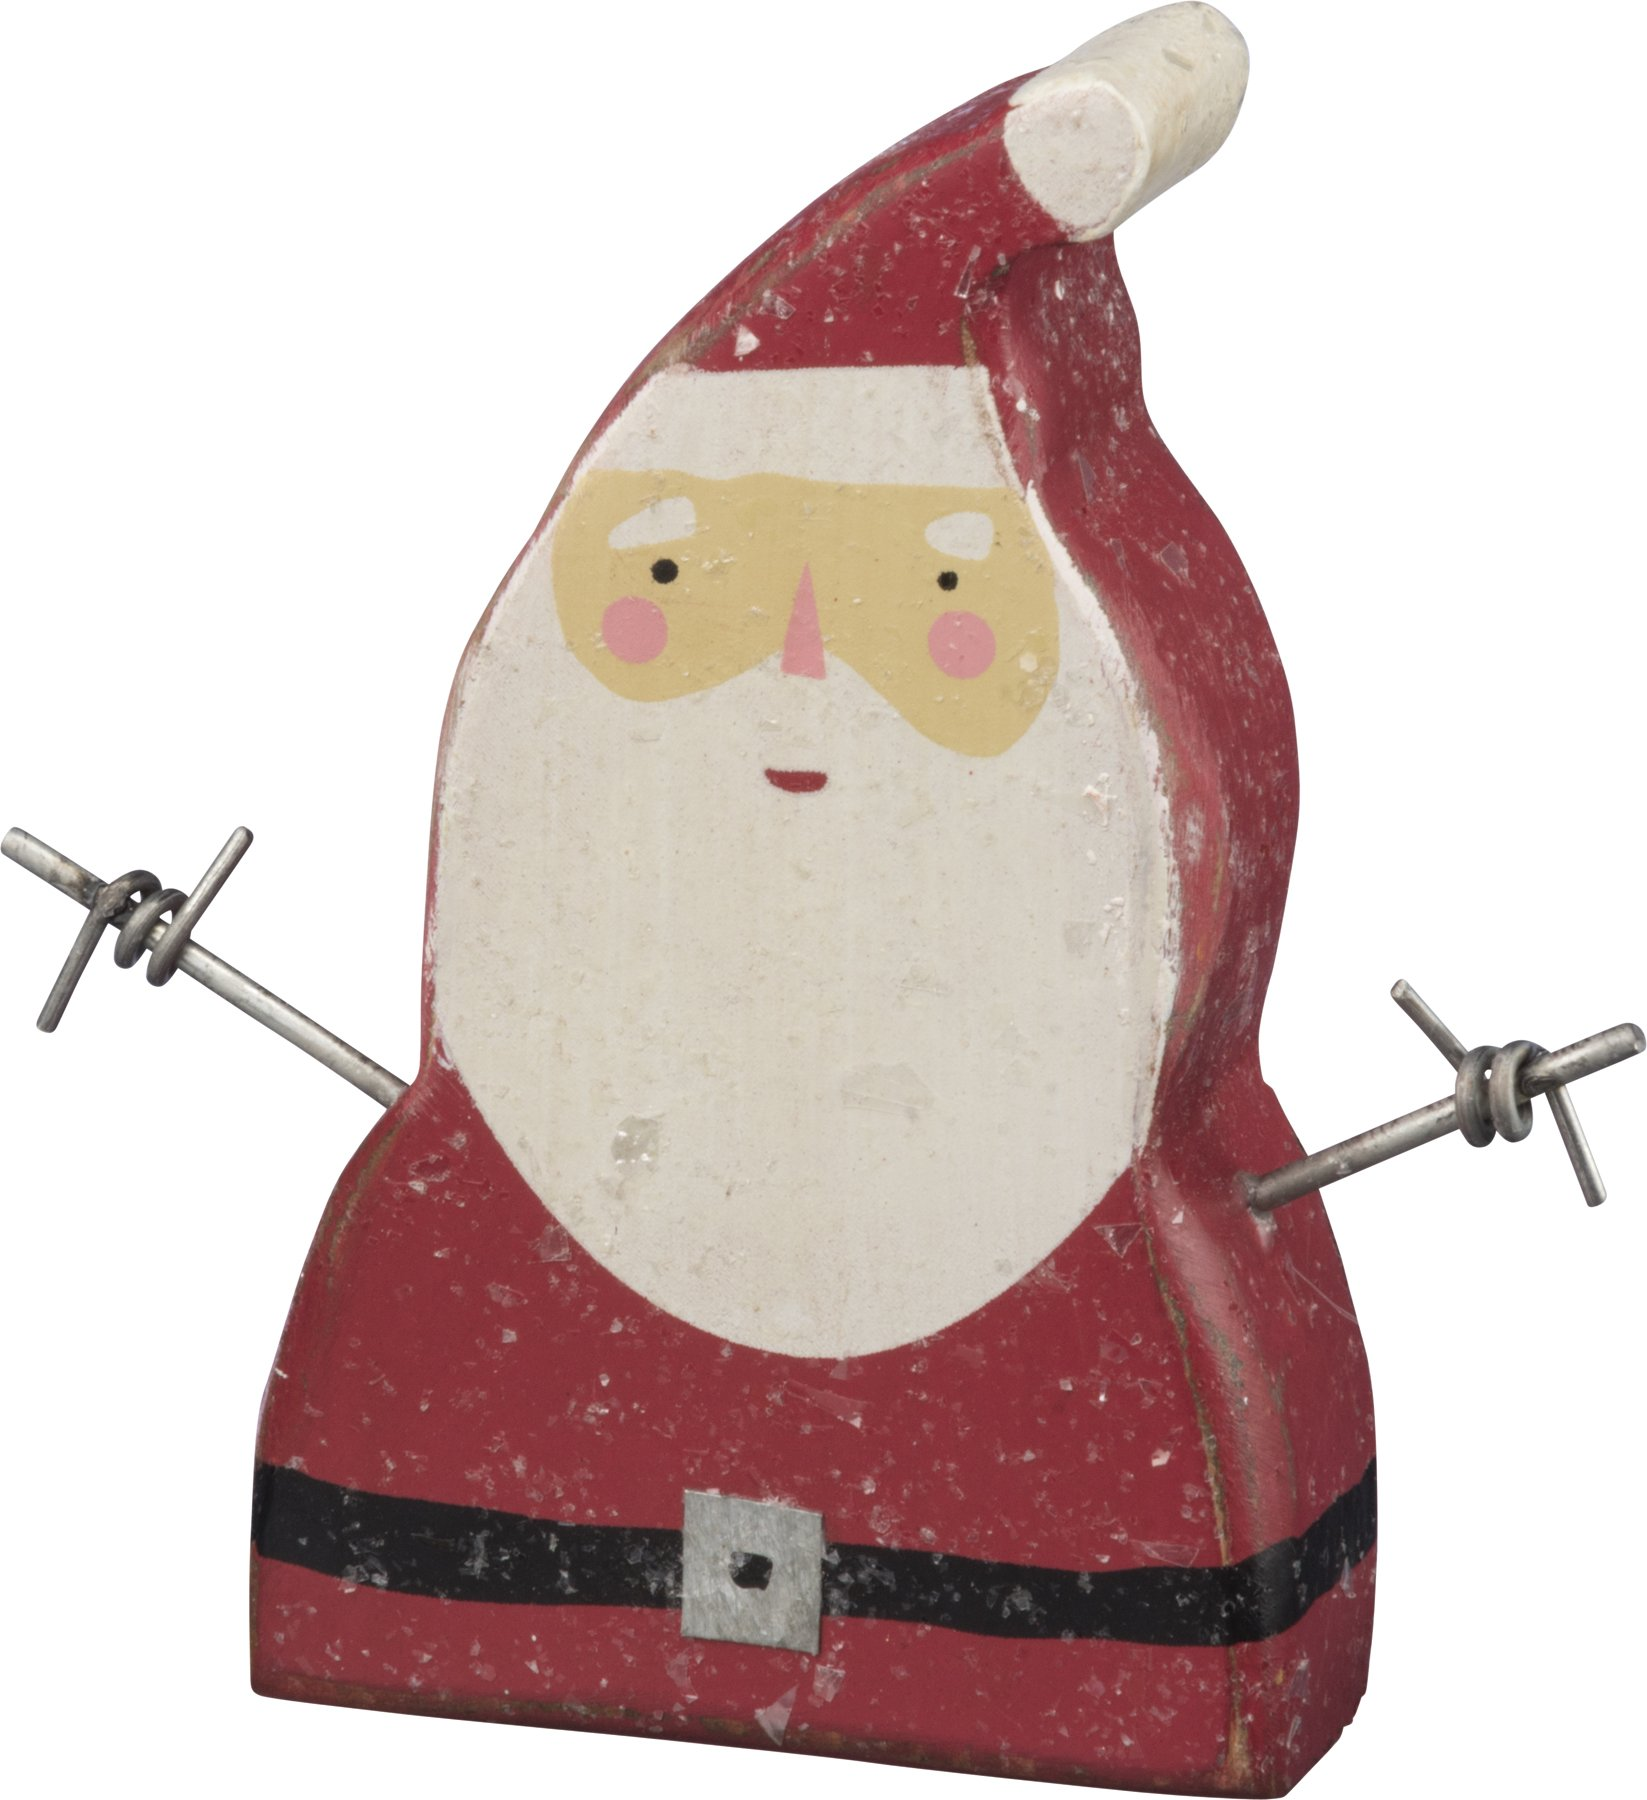 PBK Decor Prim Chunky Wood Merry Santa Sitter